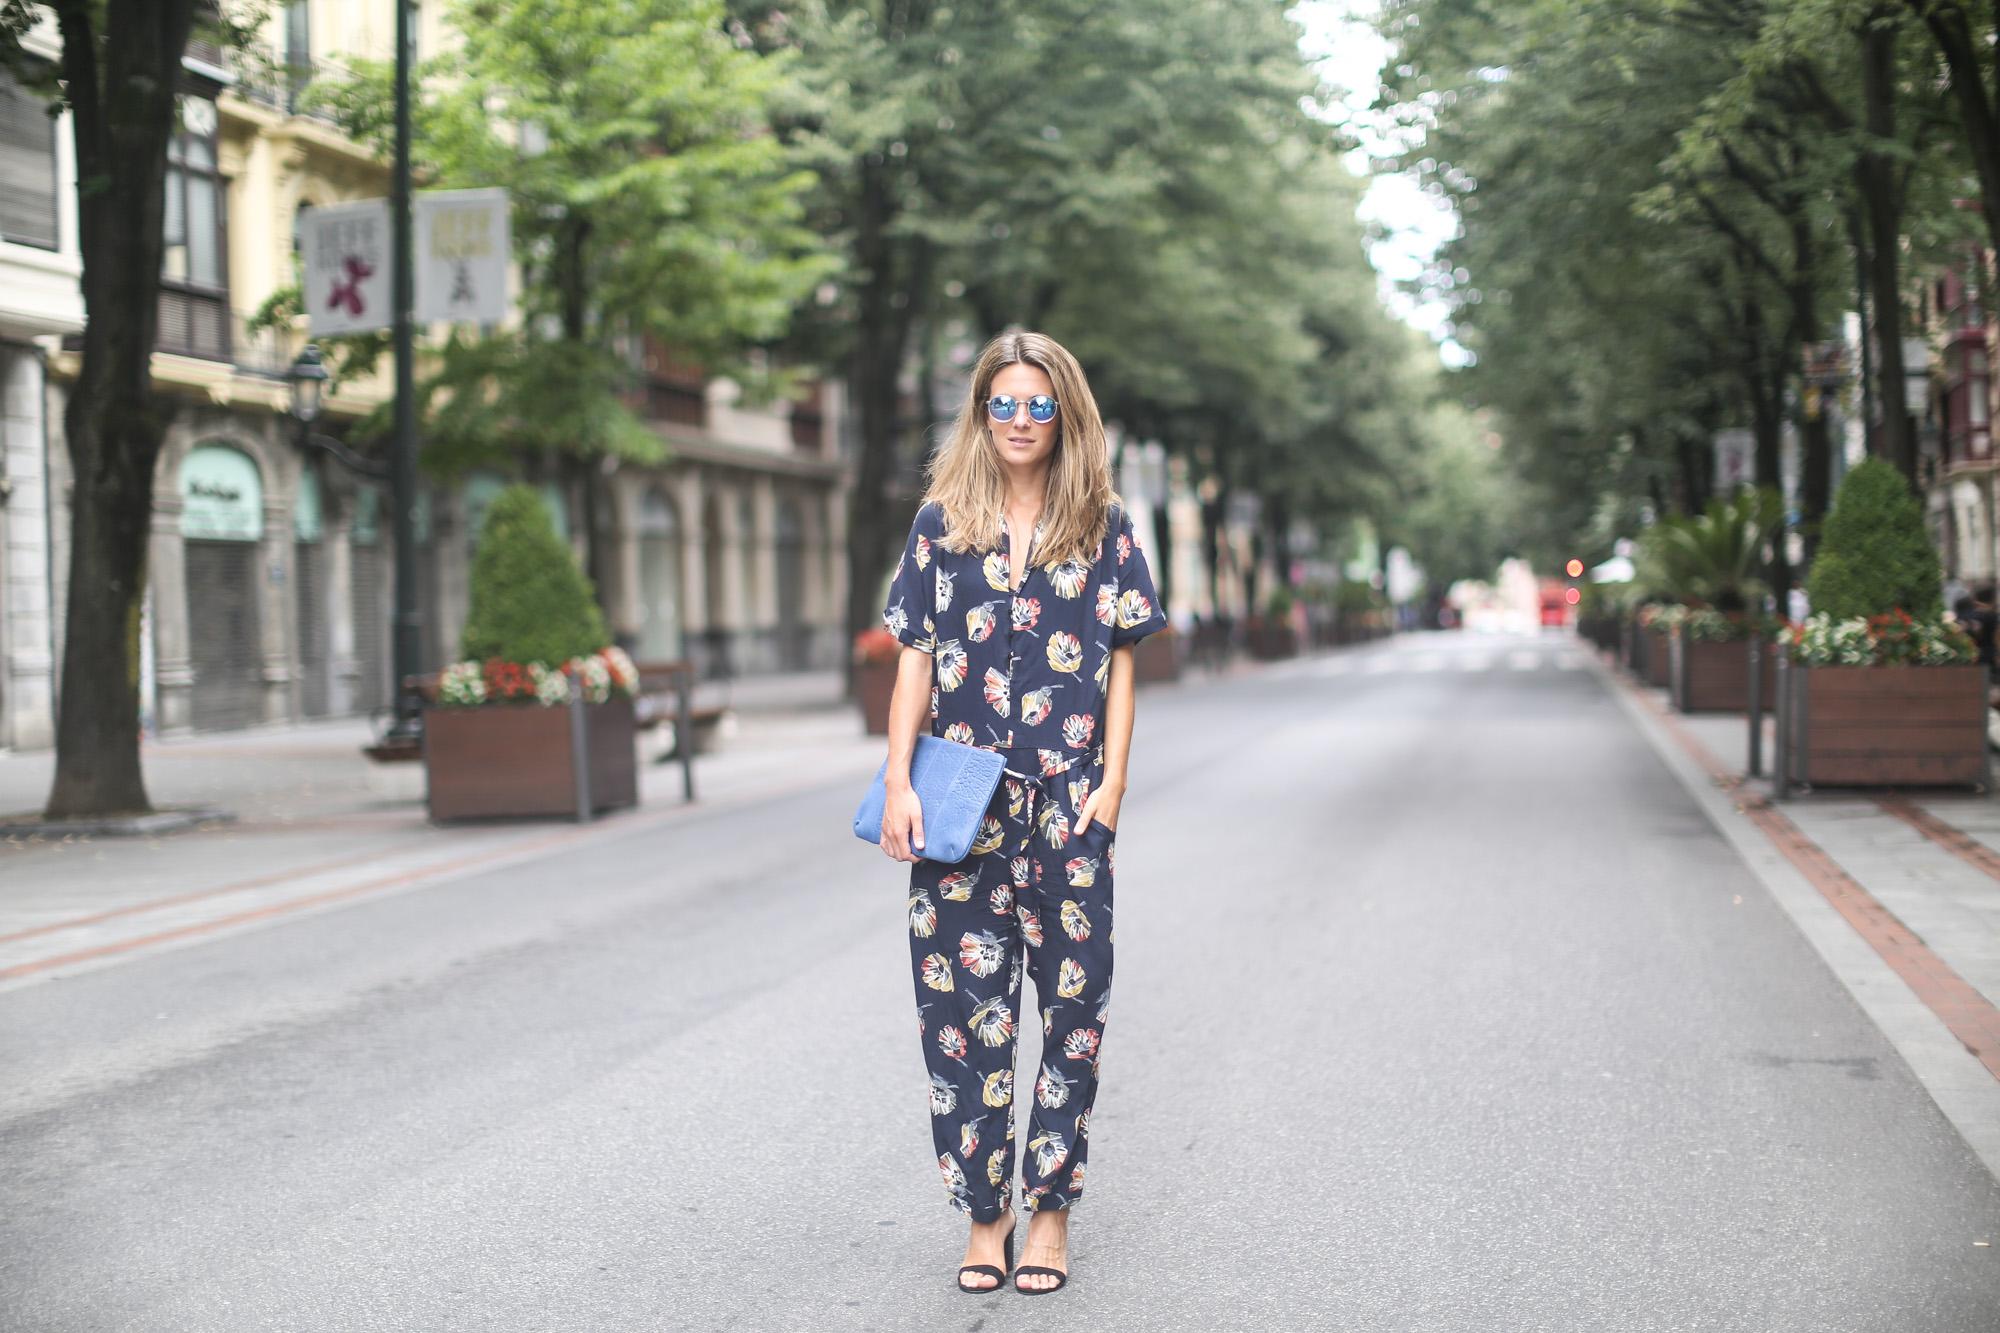 Clochet_streetstyle_zara_floral_jumpsuit_artemisia_leather_clutch-2